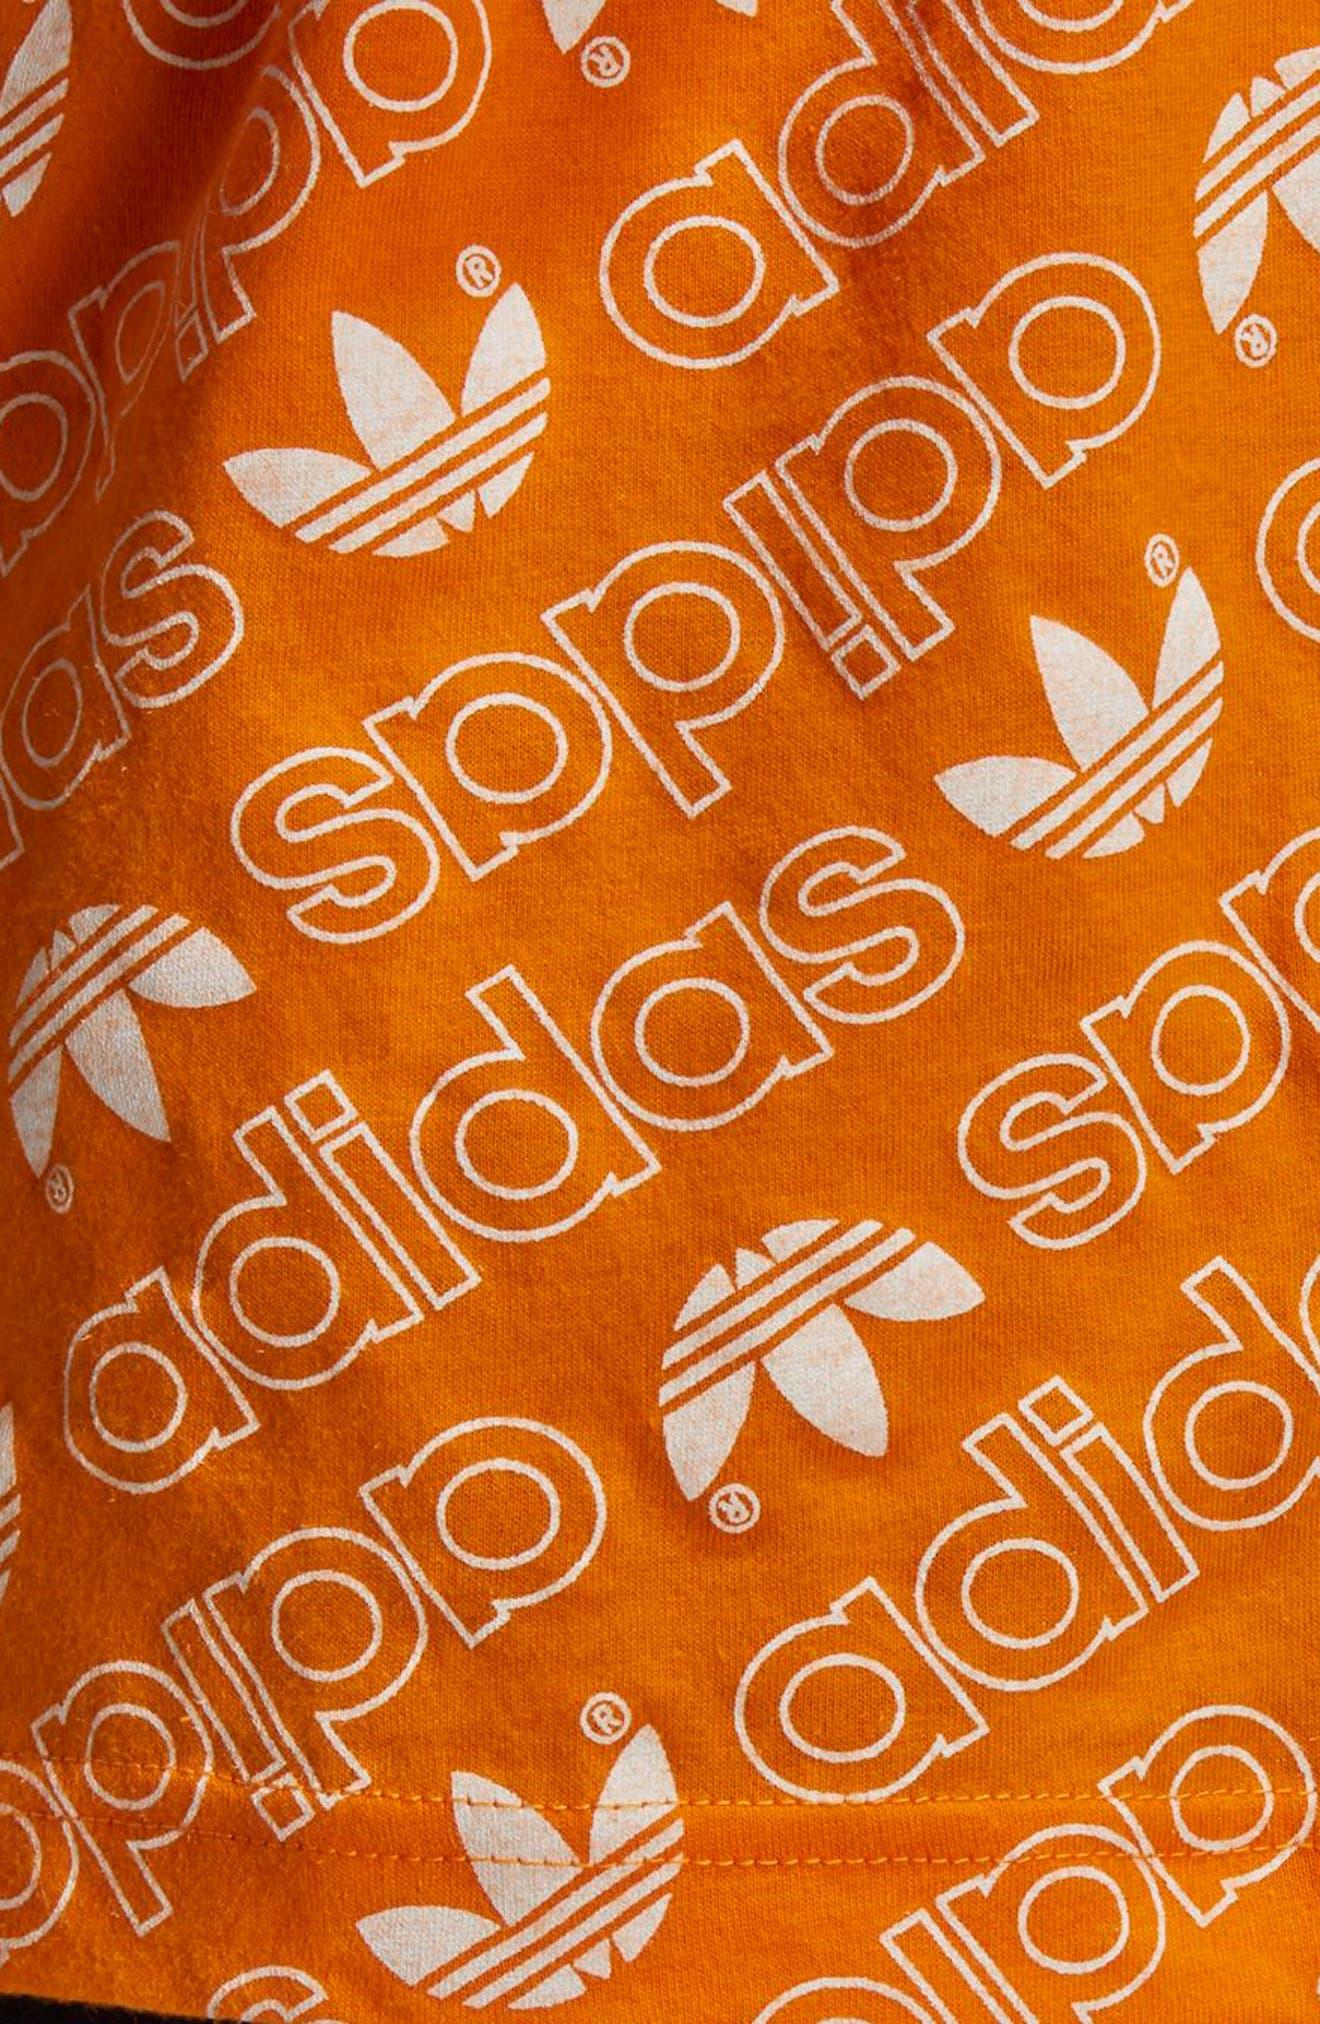 Monogram Allover Print T-Shirt,                             Alternate thumbnail 5, color,                             Bright Orange